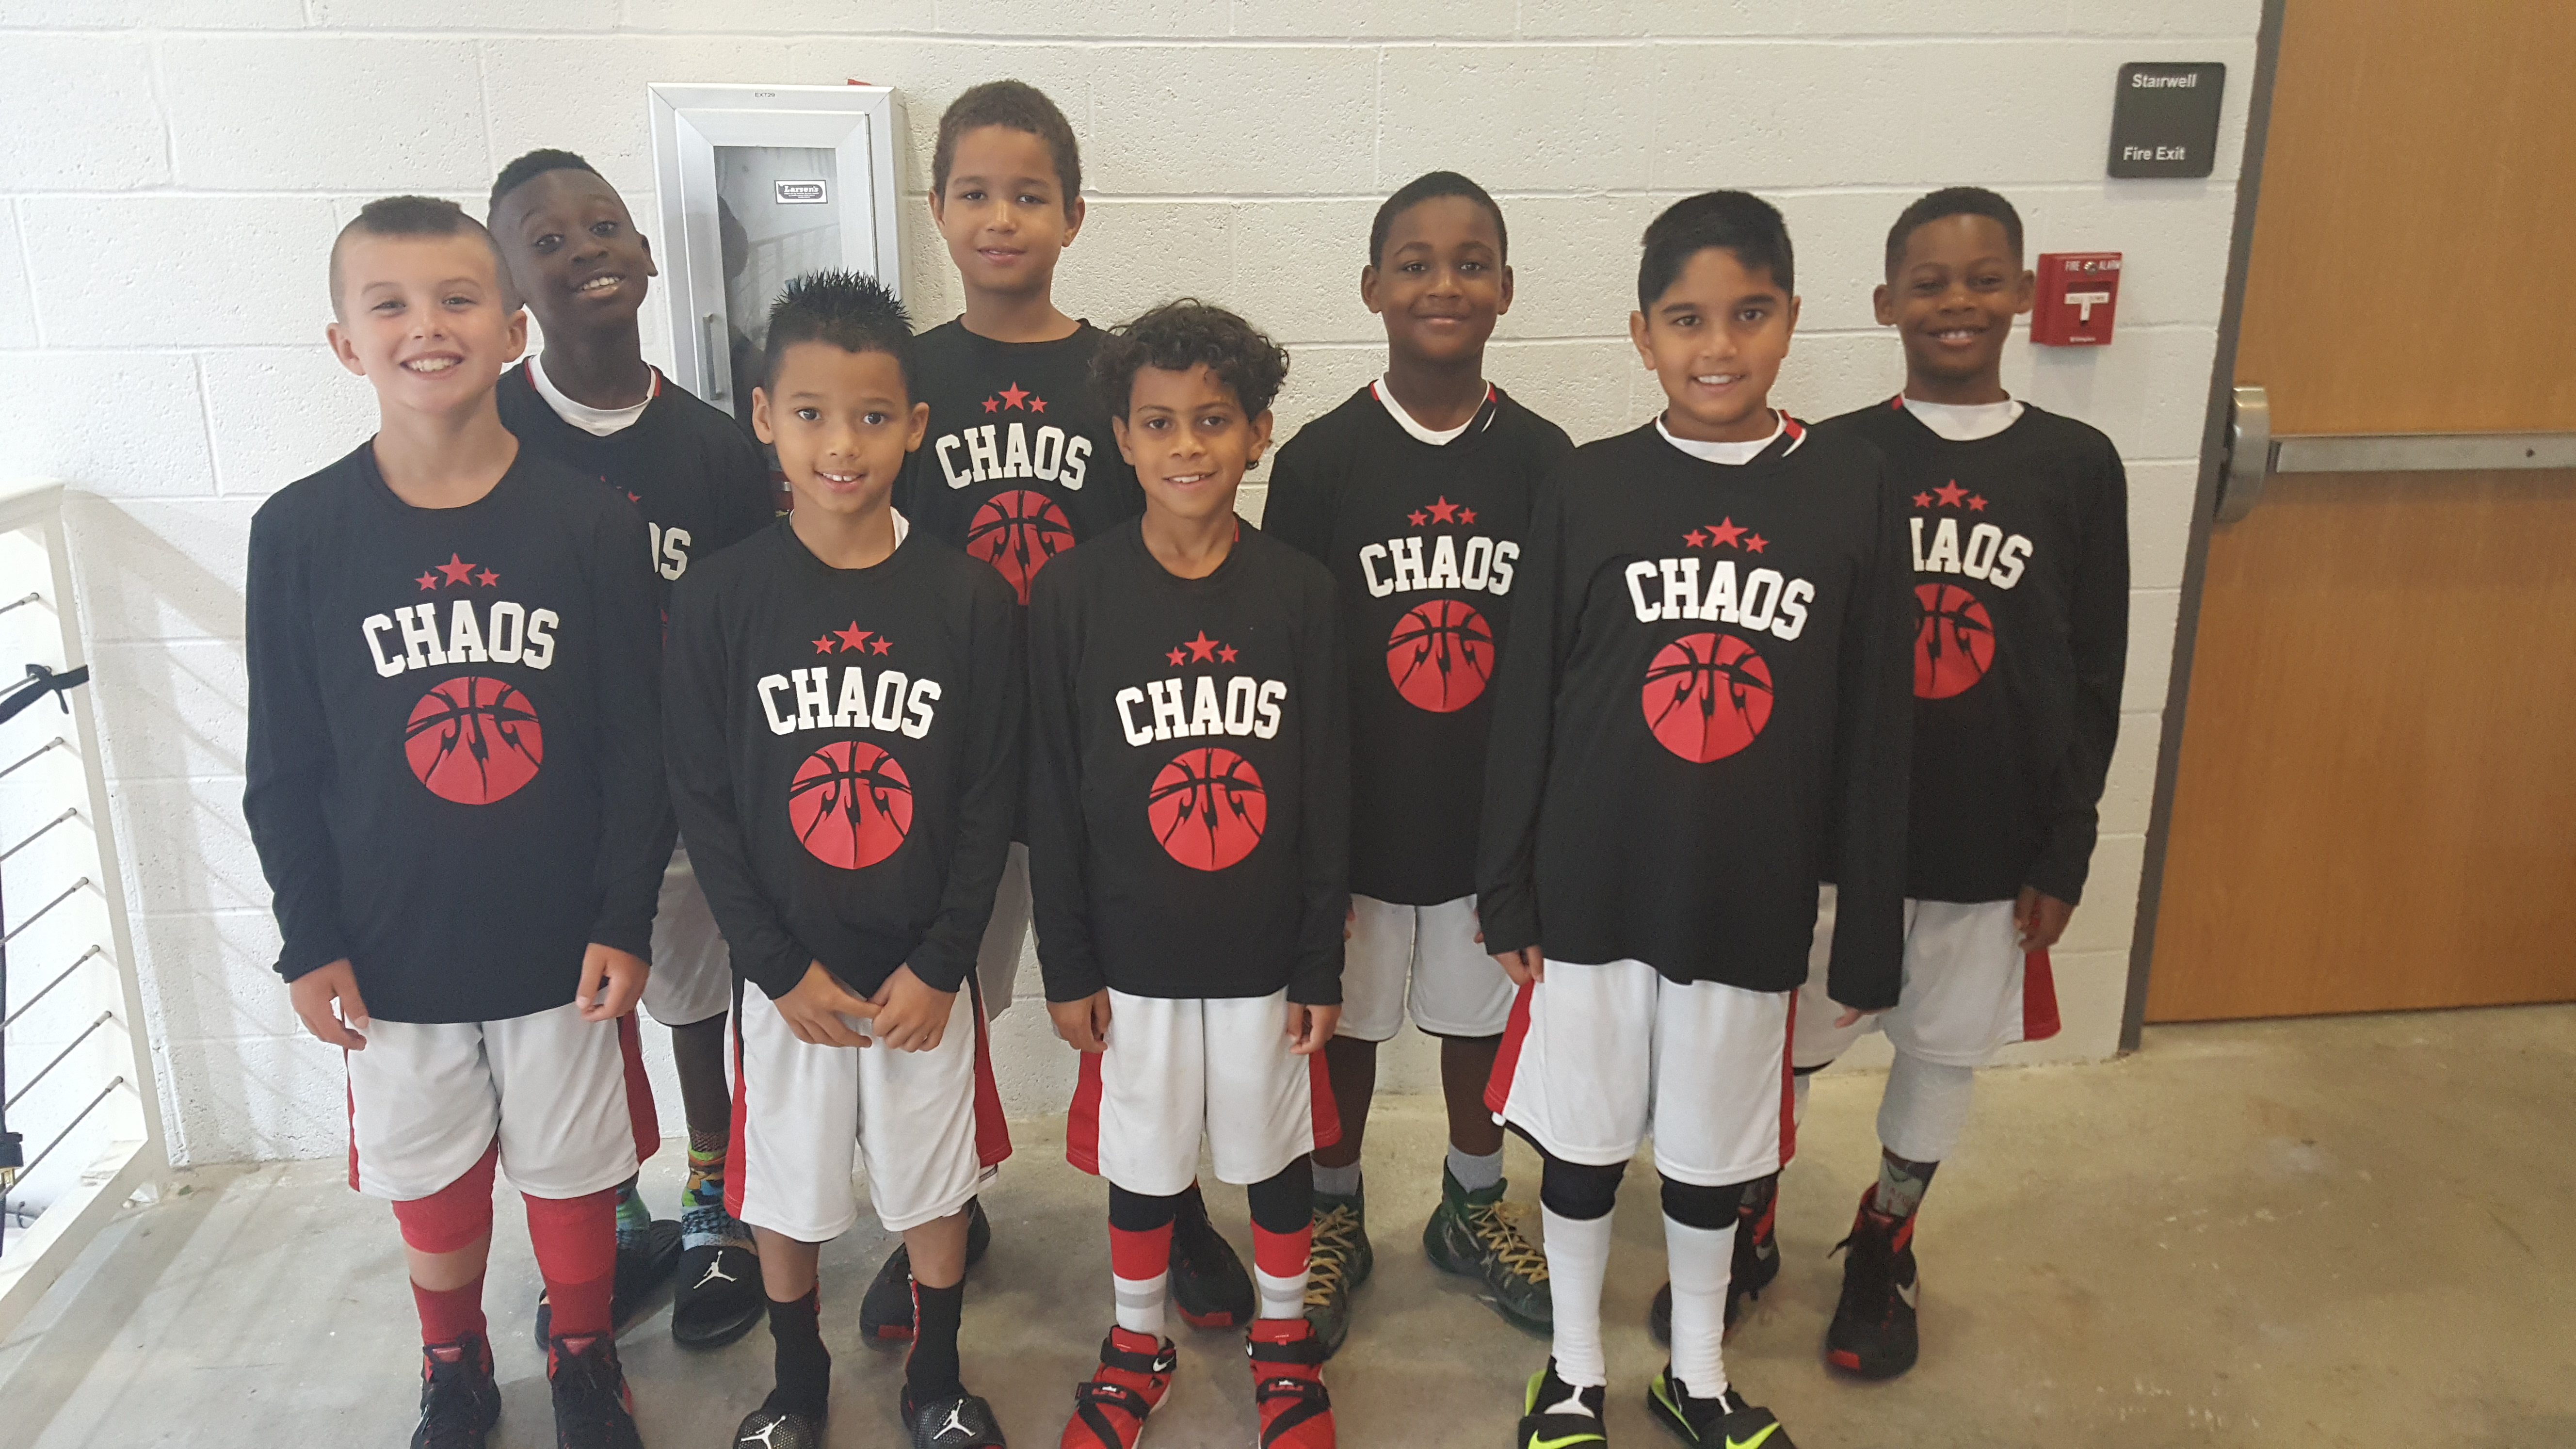 Custom T-Shirts for Orlando Chaos Aau 9 U Basketball Team - Shirt ...